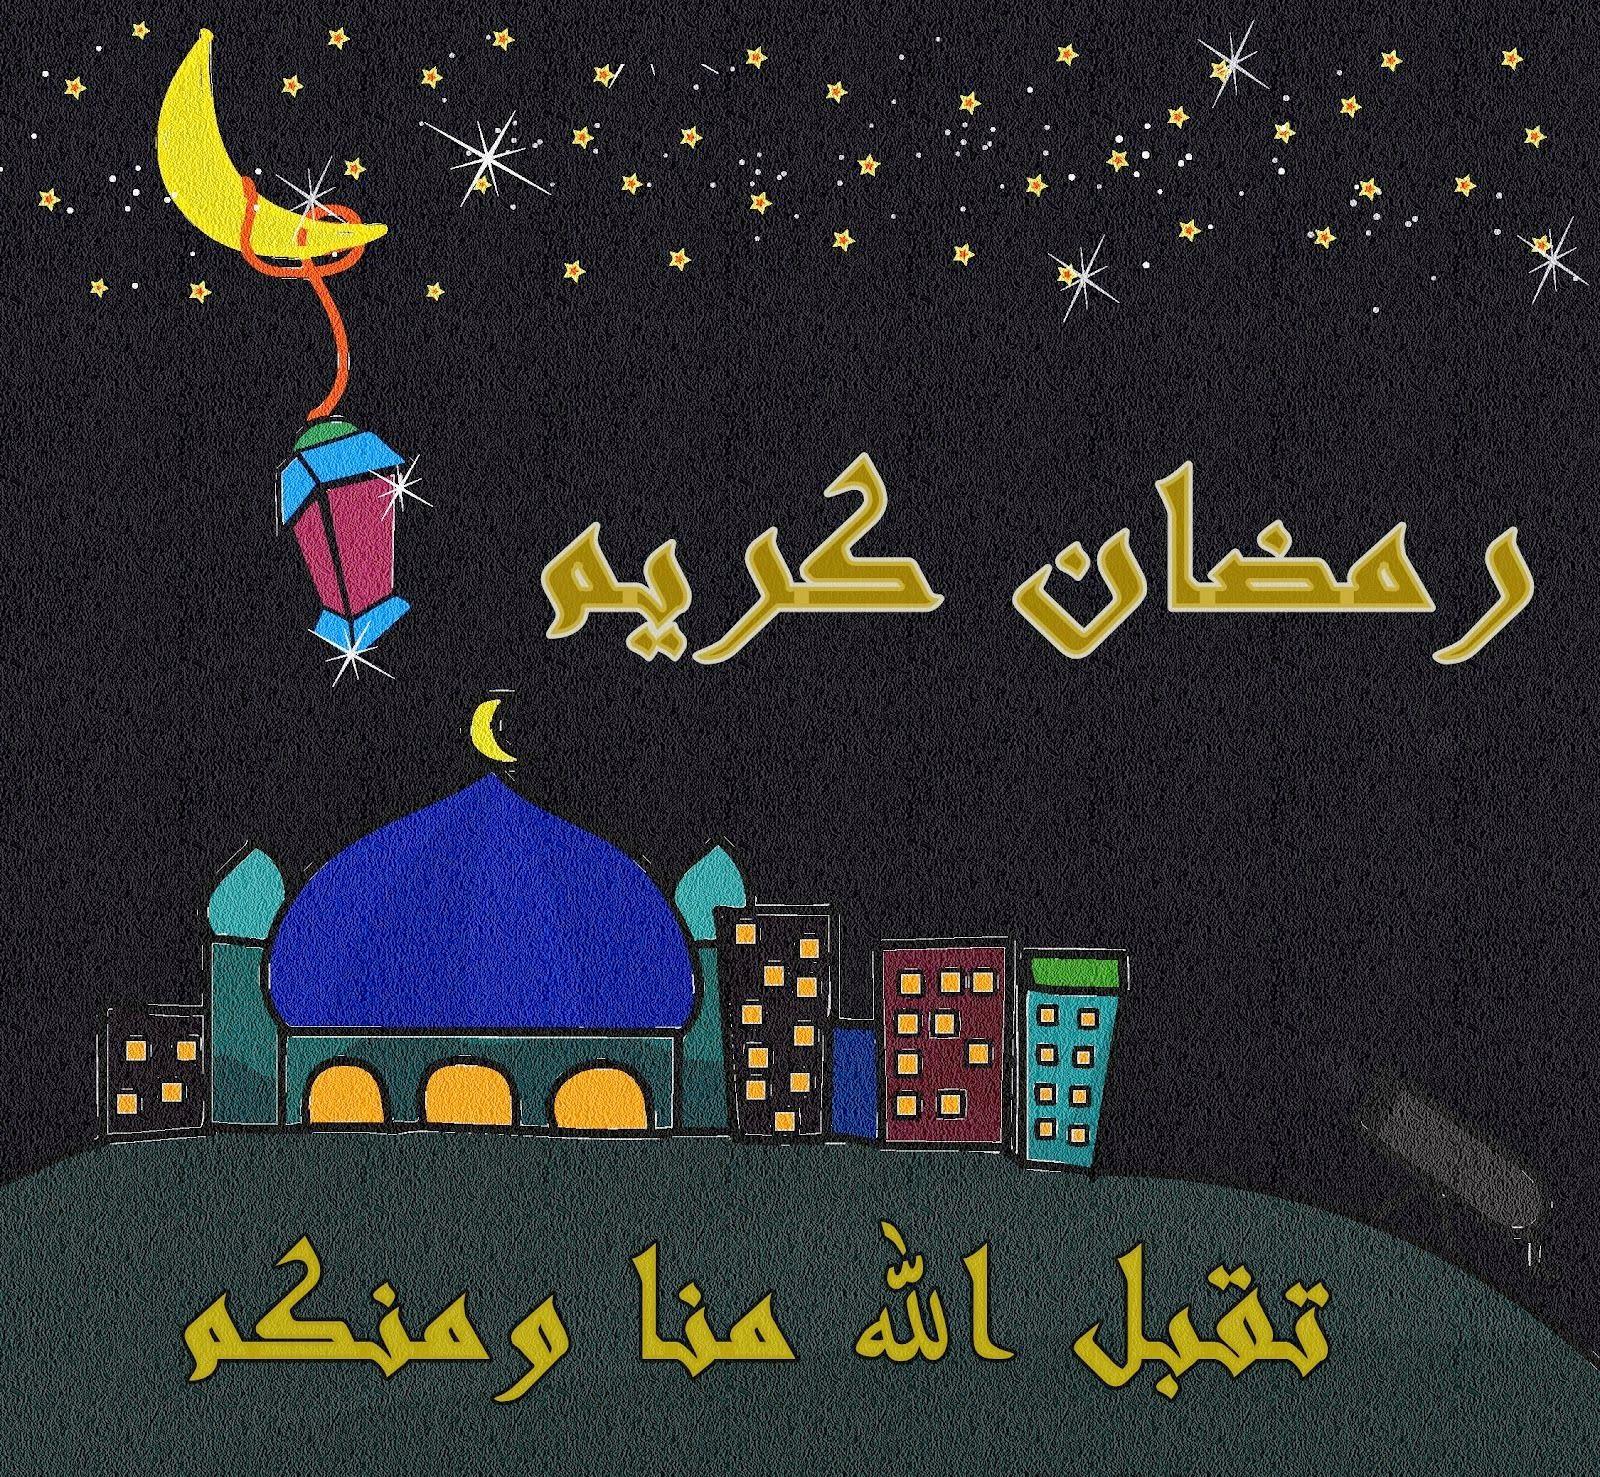 Gambar Kartun Anak Ramadhan Wallpaper Ramadhan Mubarok - Illustration - HD Wallpaper